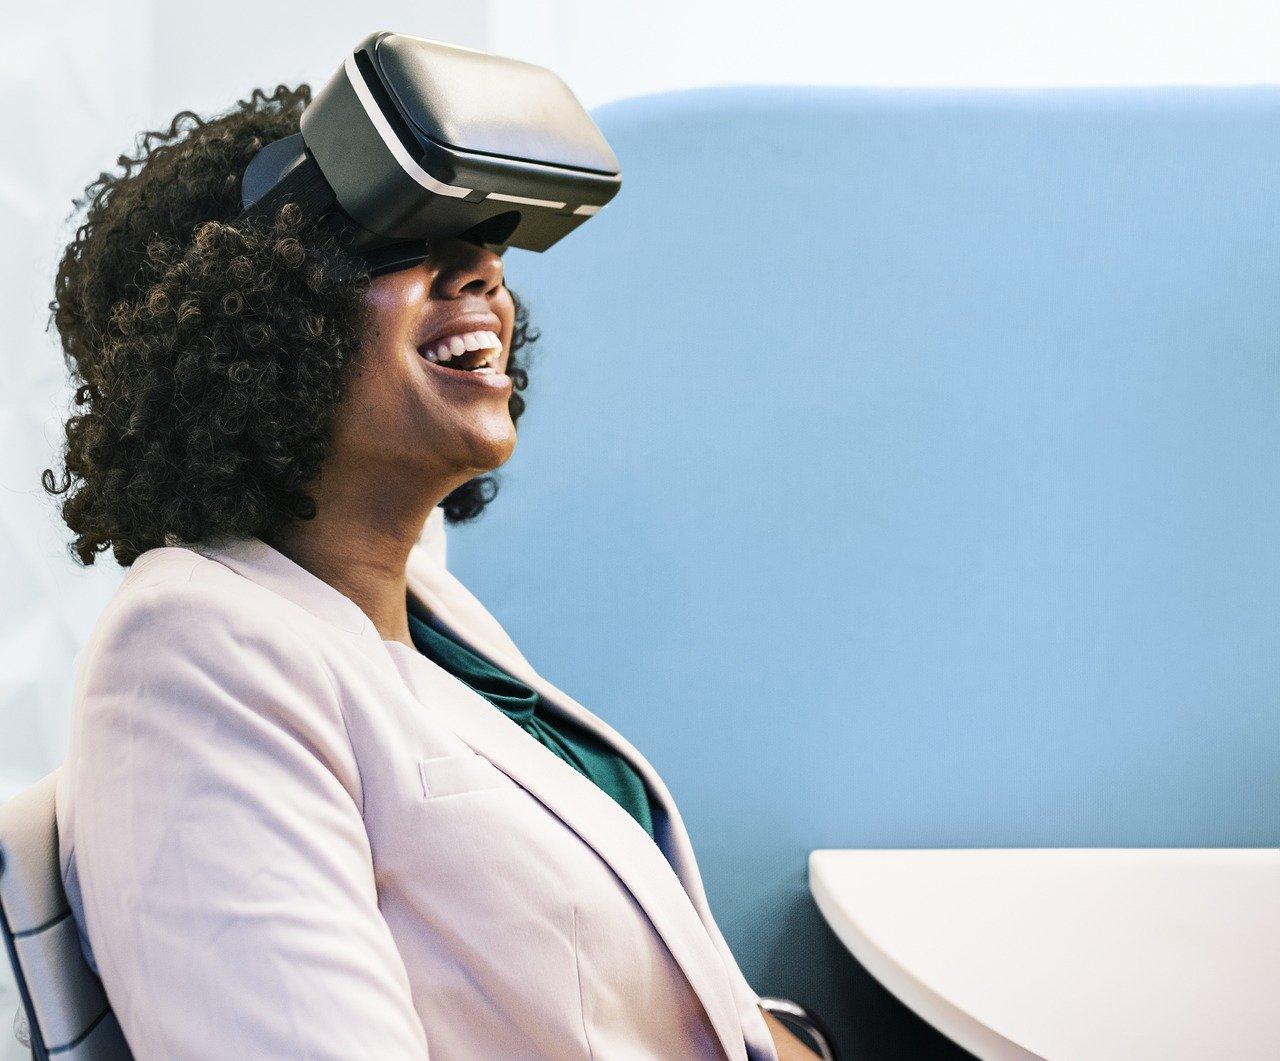 A woman puts on a virtual reality goggles